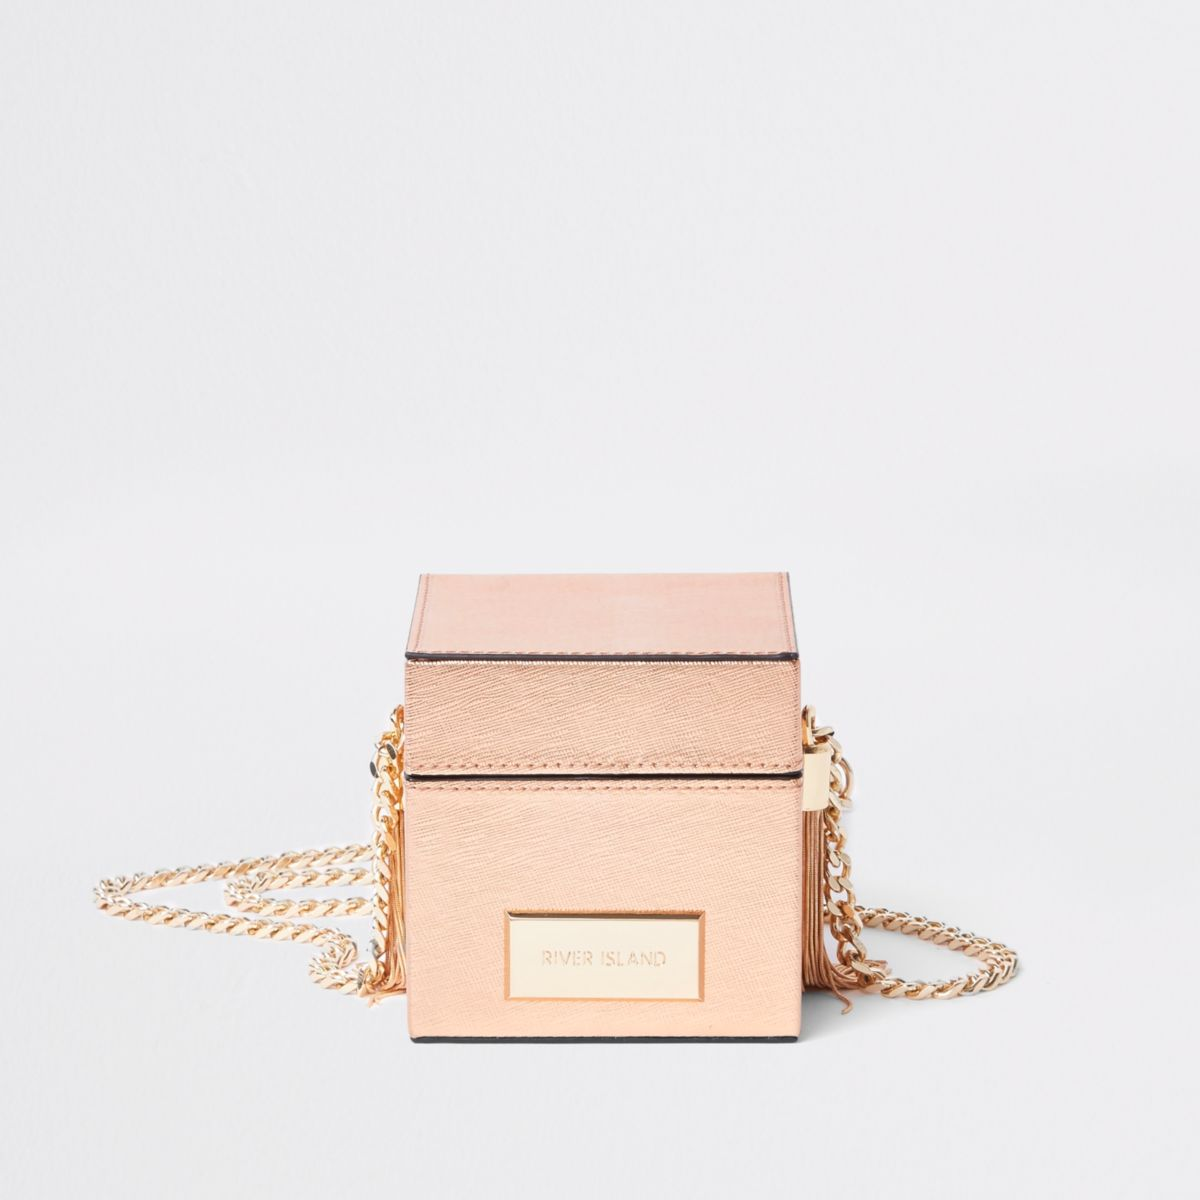 Rose gold box shaped cross body bag